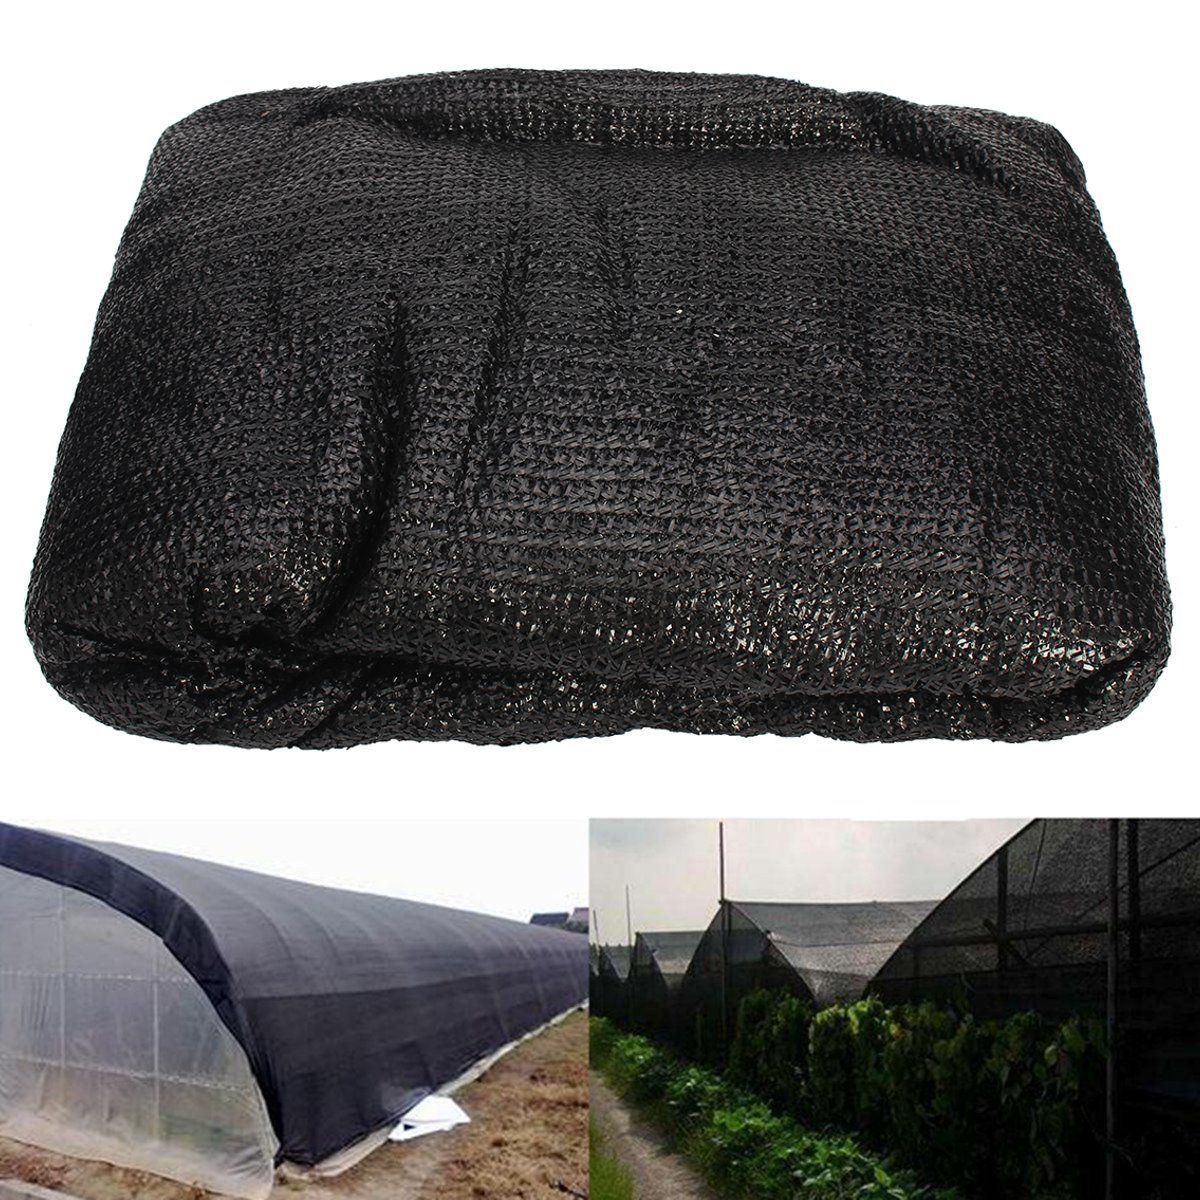 Anti-UV Sunshade Net Outdoor Garden Sunscreen Sunblock Shade Net Plant Car Cover